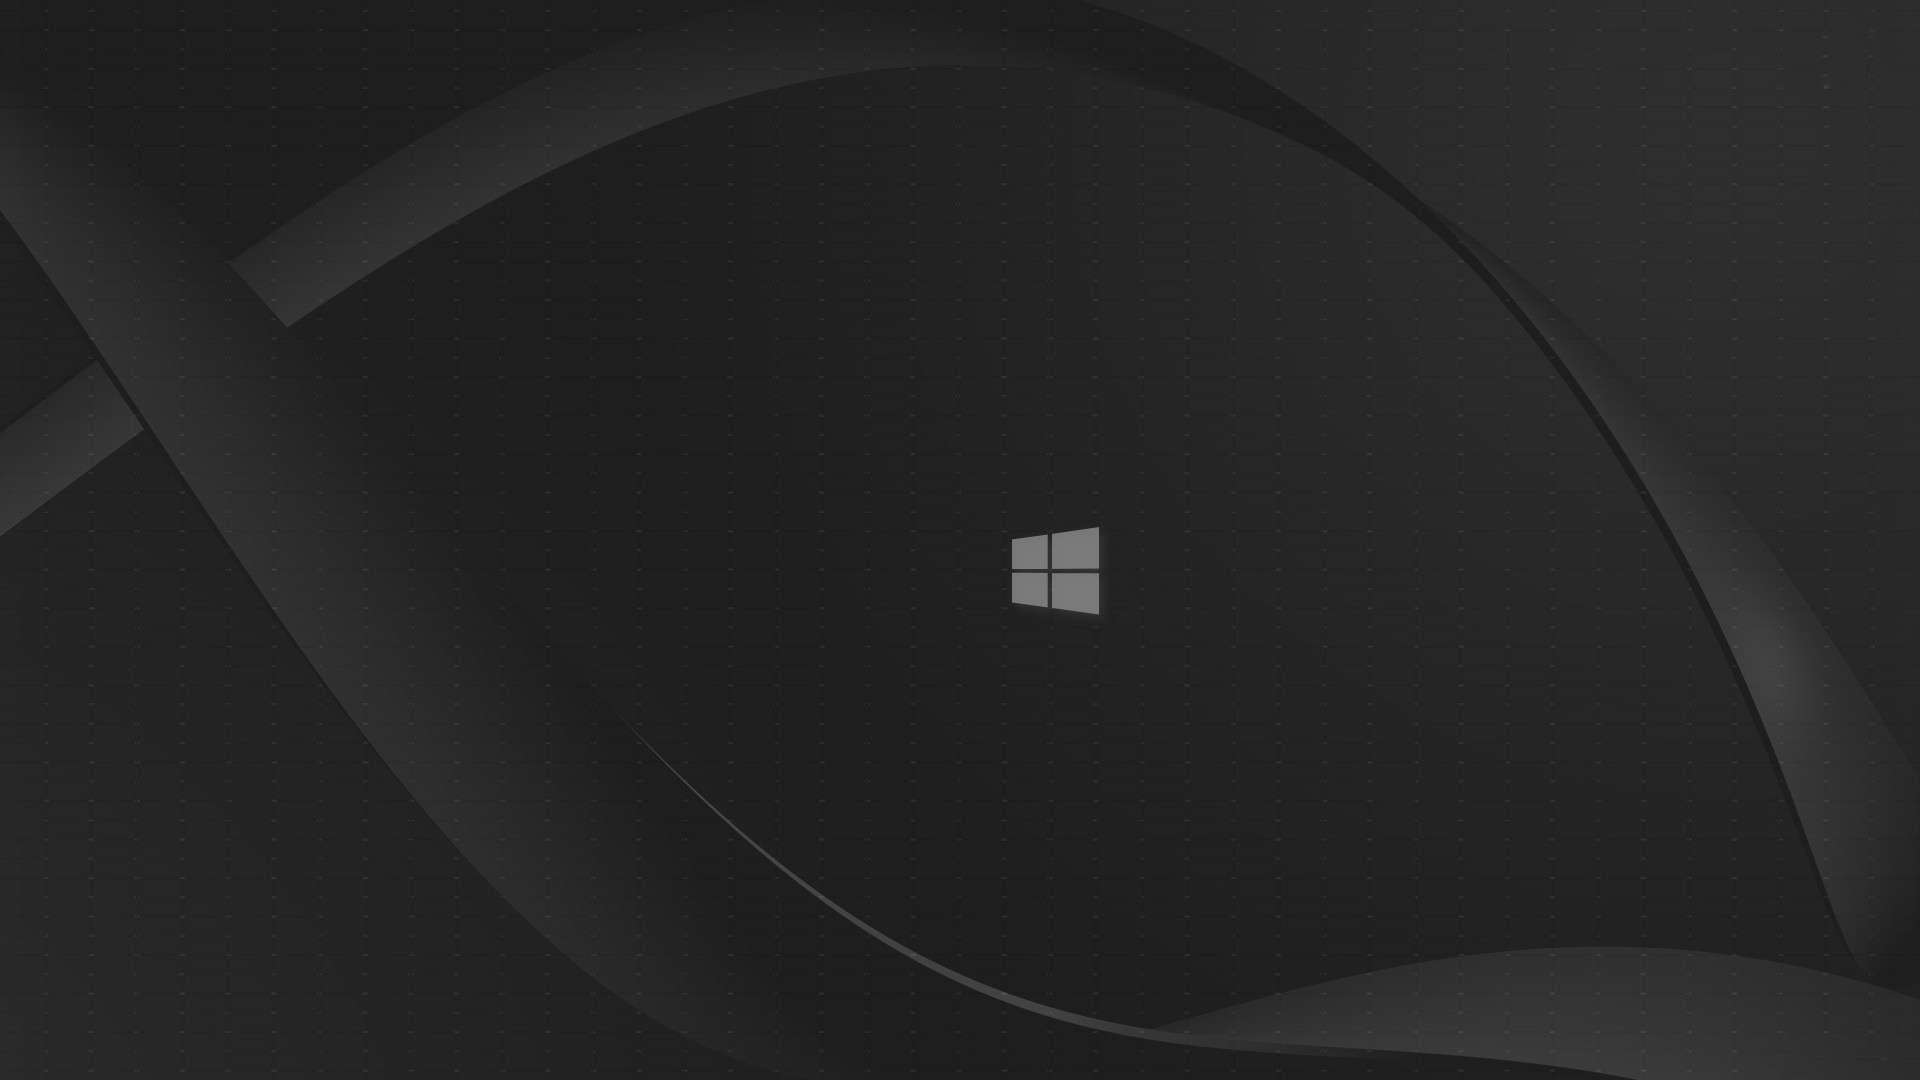 47+ Black Windows 10 Wallpaper on WallpaperSafari